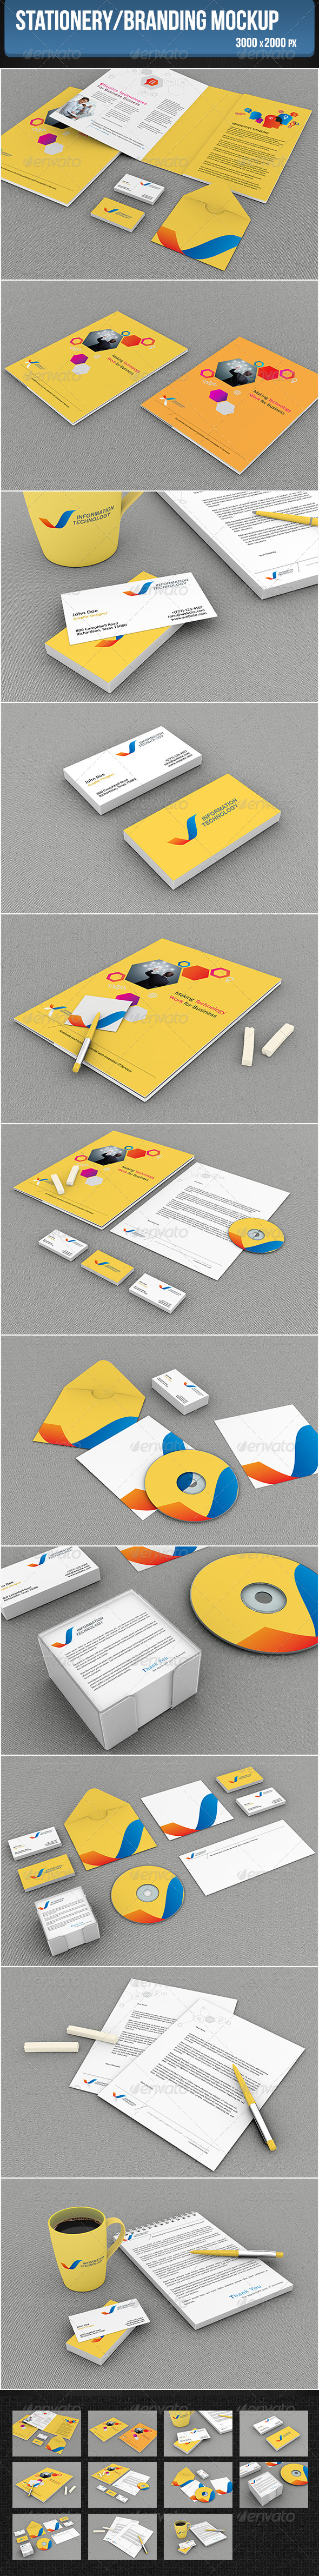 GraphicRiver Stationery Branding Mockup 5272681